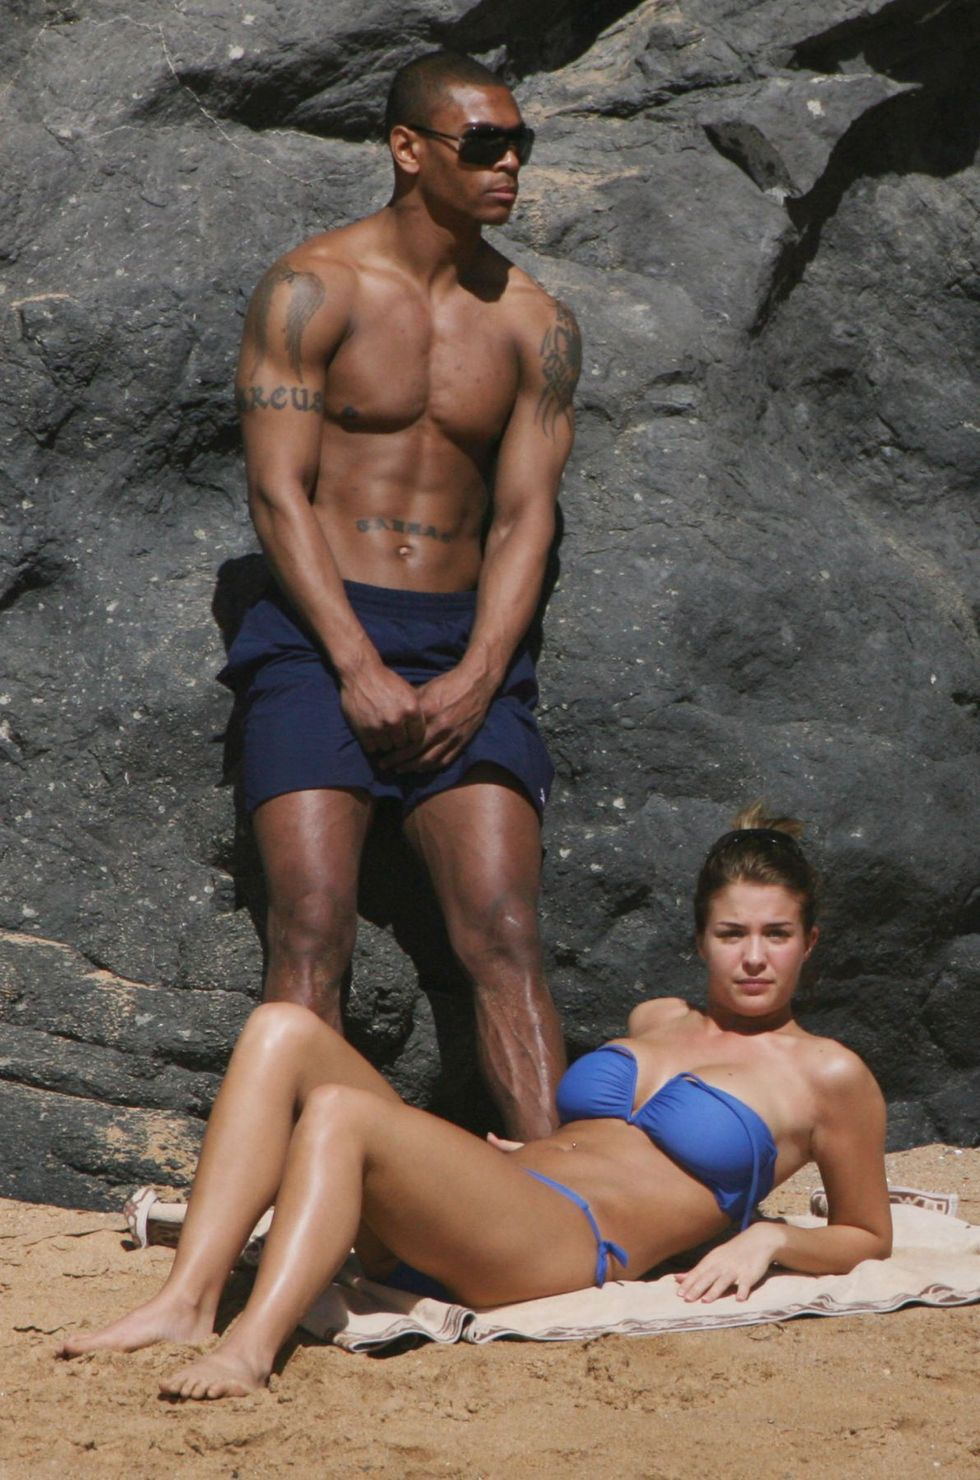 gemma-atkinson-blue-bikini-candids-on-the-beach-01